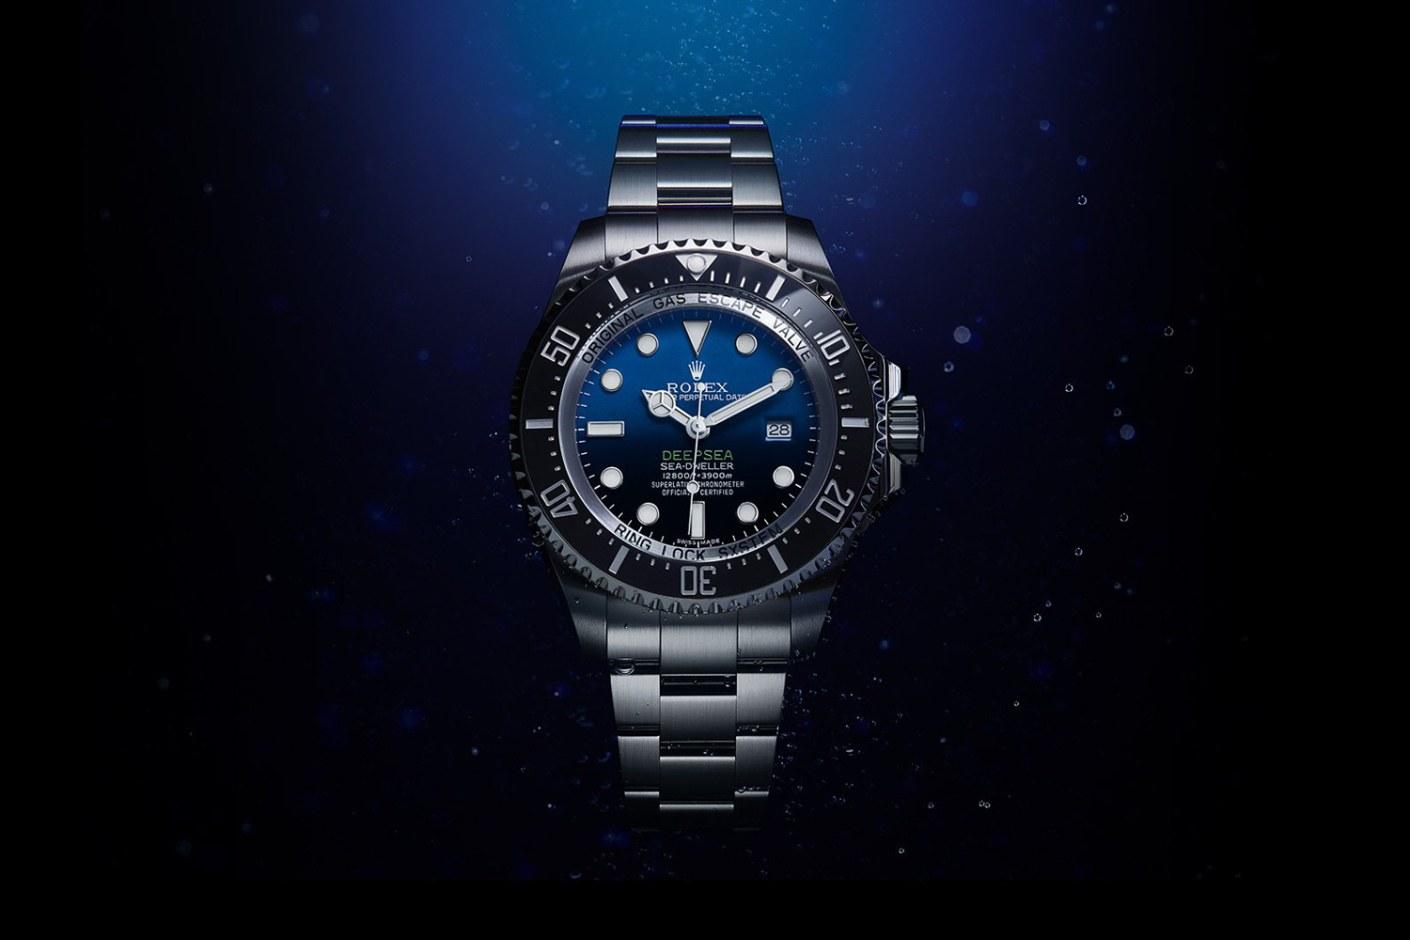 rolex-deepsea-d-blue-dial-1-trends-periodical